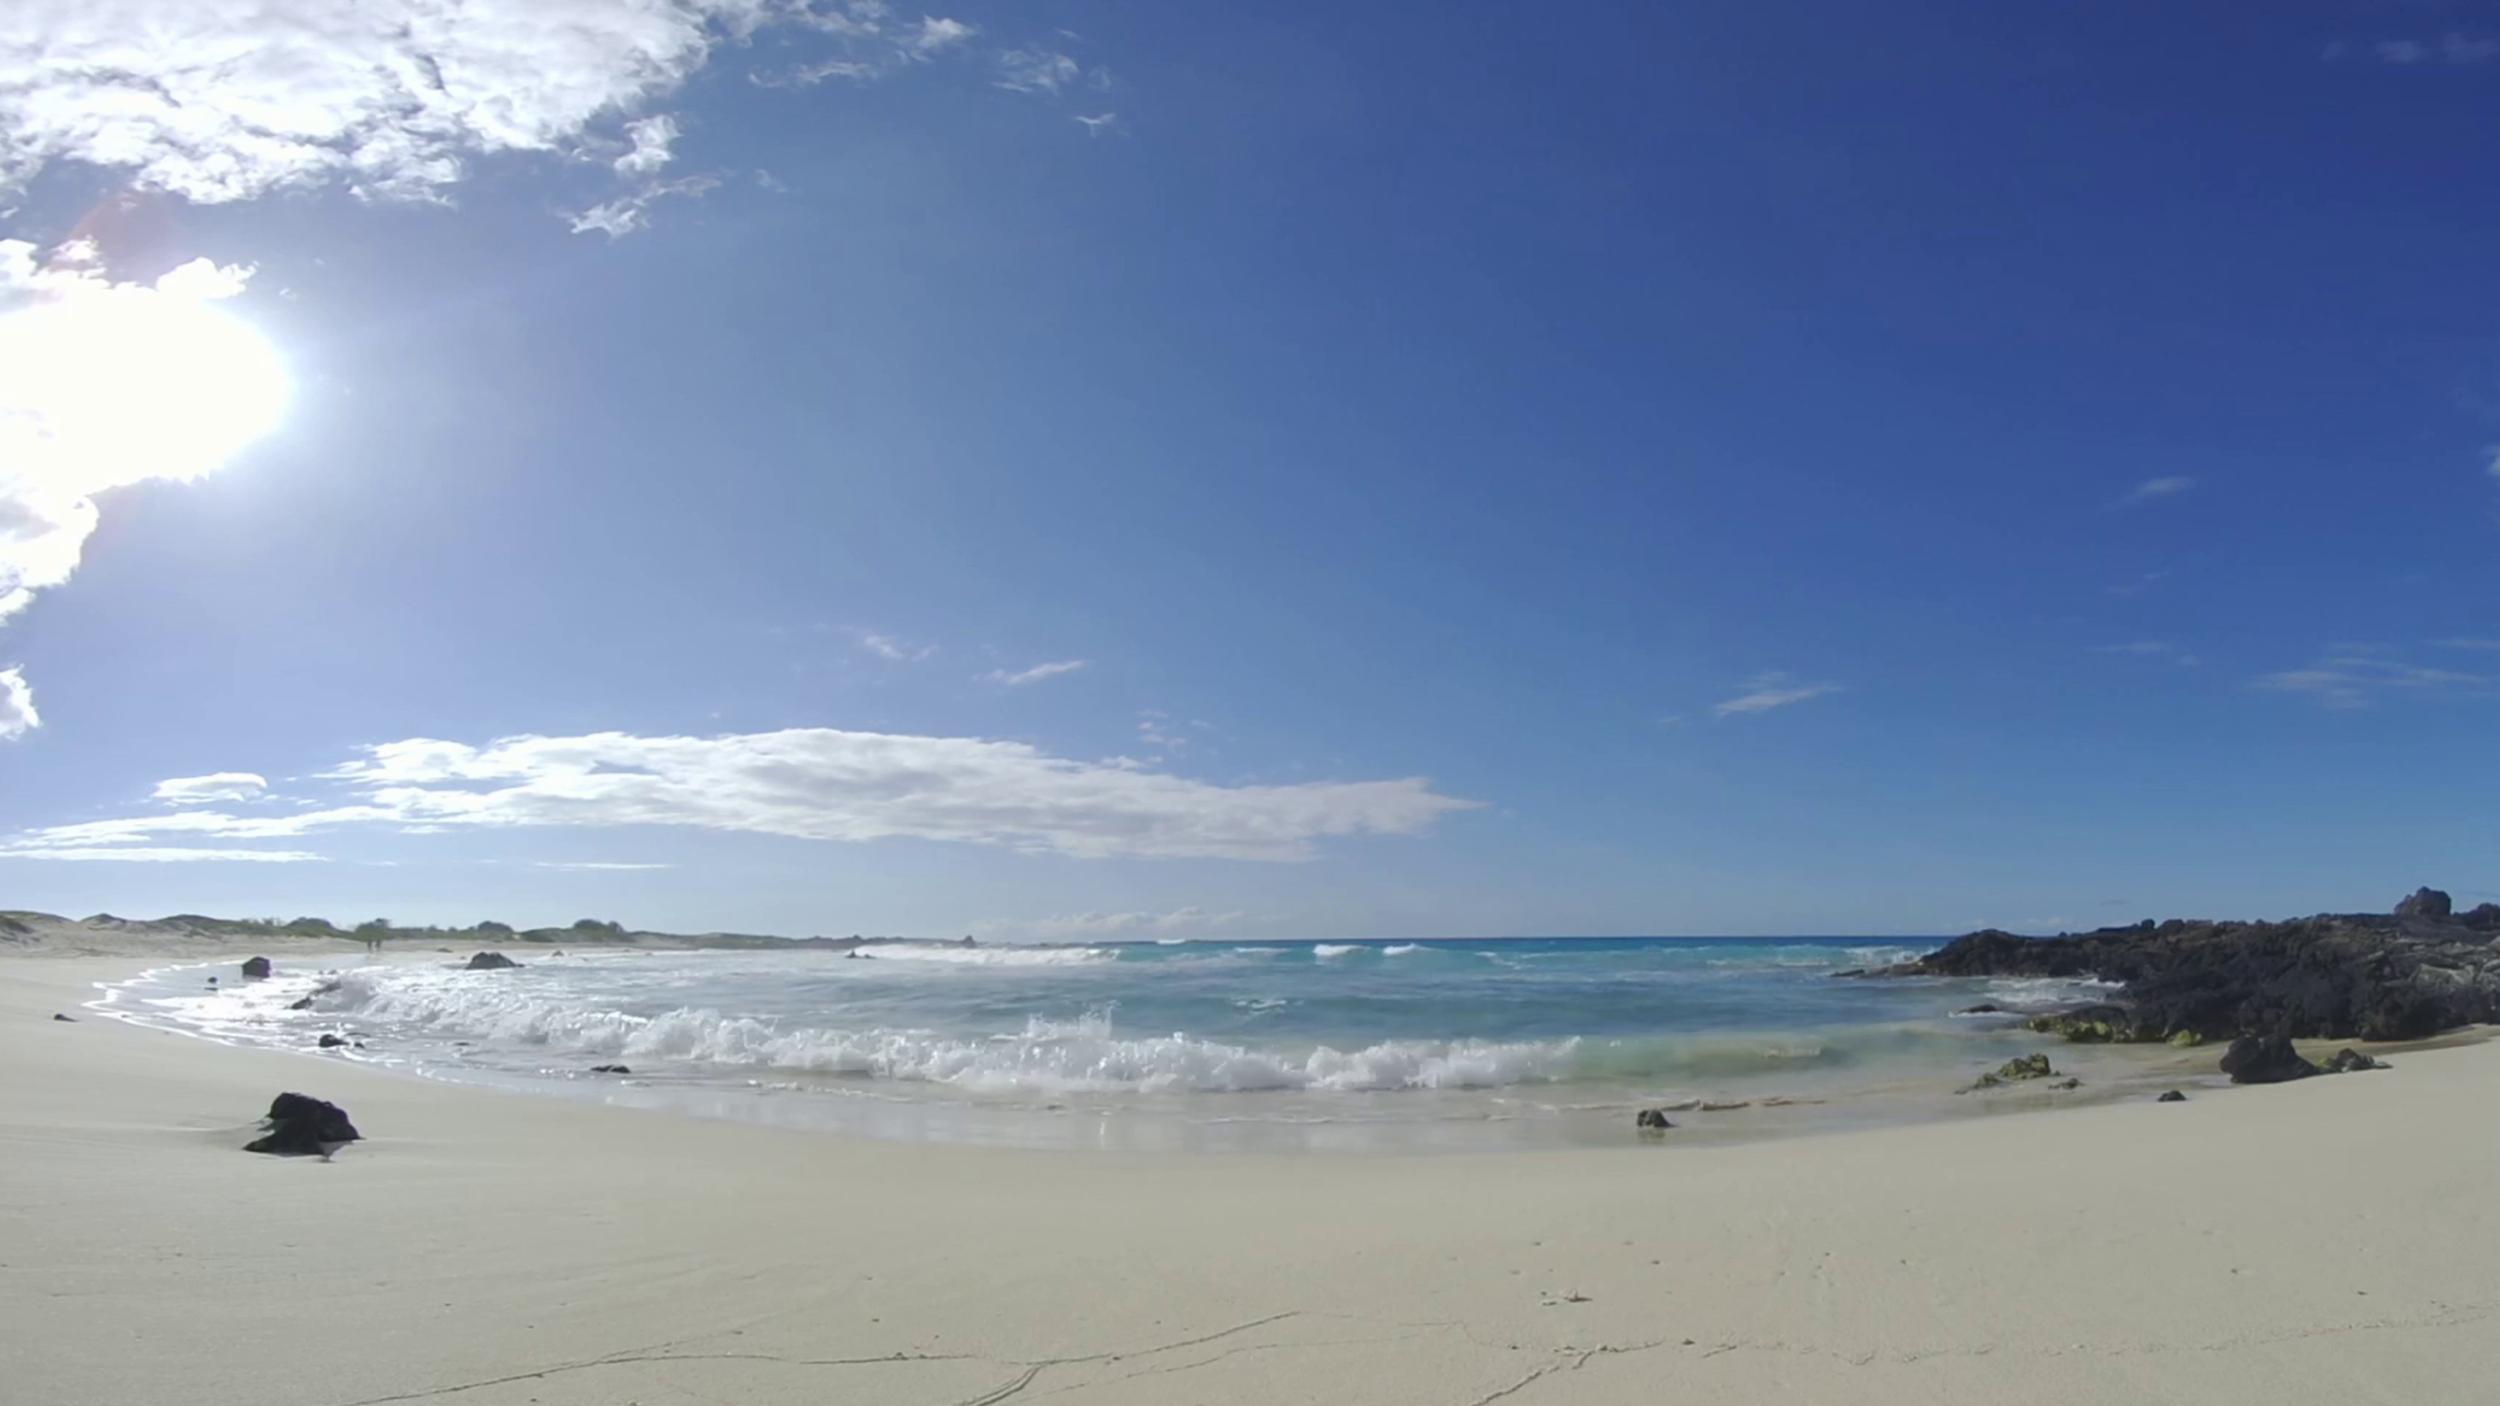 Sandy Hawaiian Beach Calm Oculus Virtual Reality